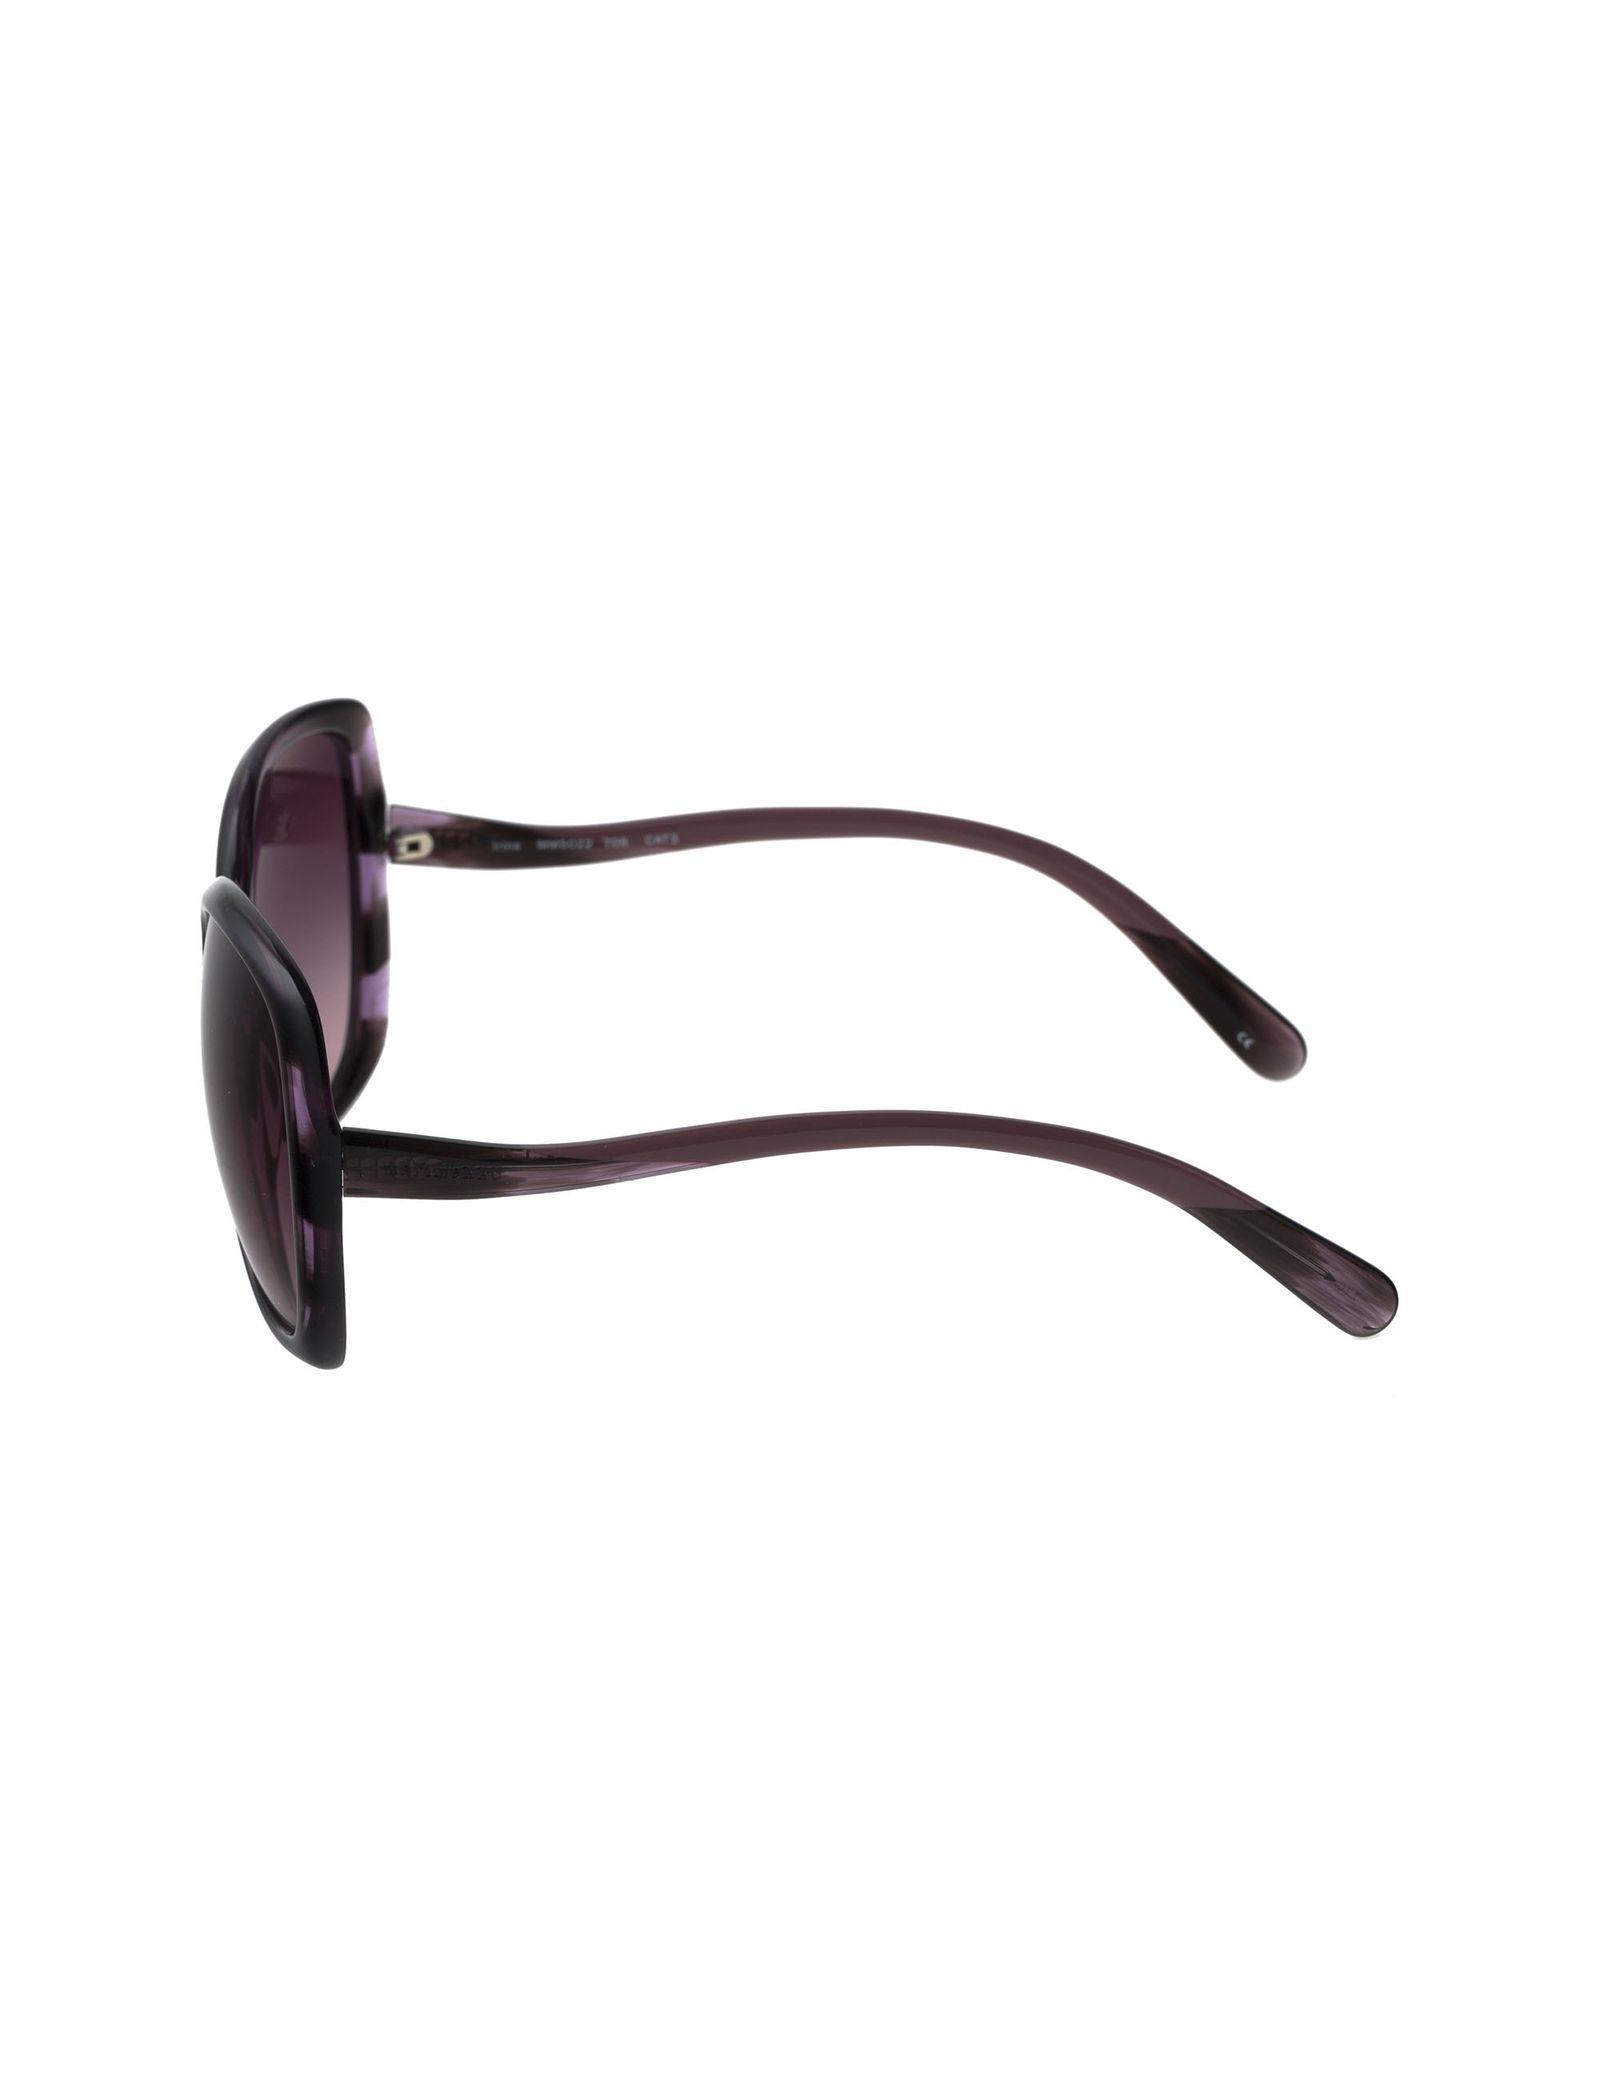 عینک آفتابی مربعی زنانه - ماریم اکو - بنفش   - 3